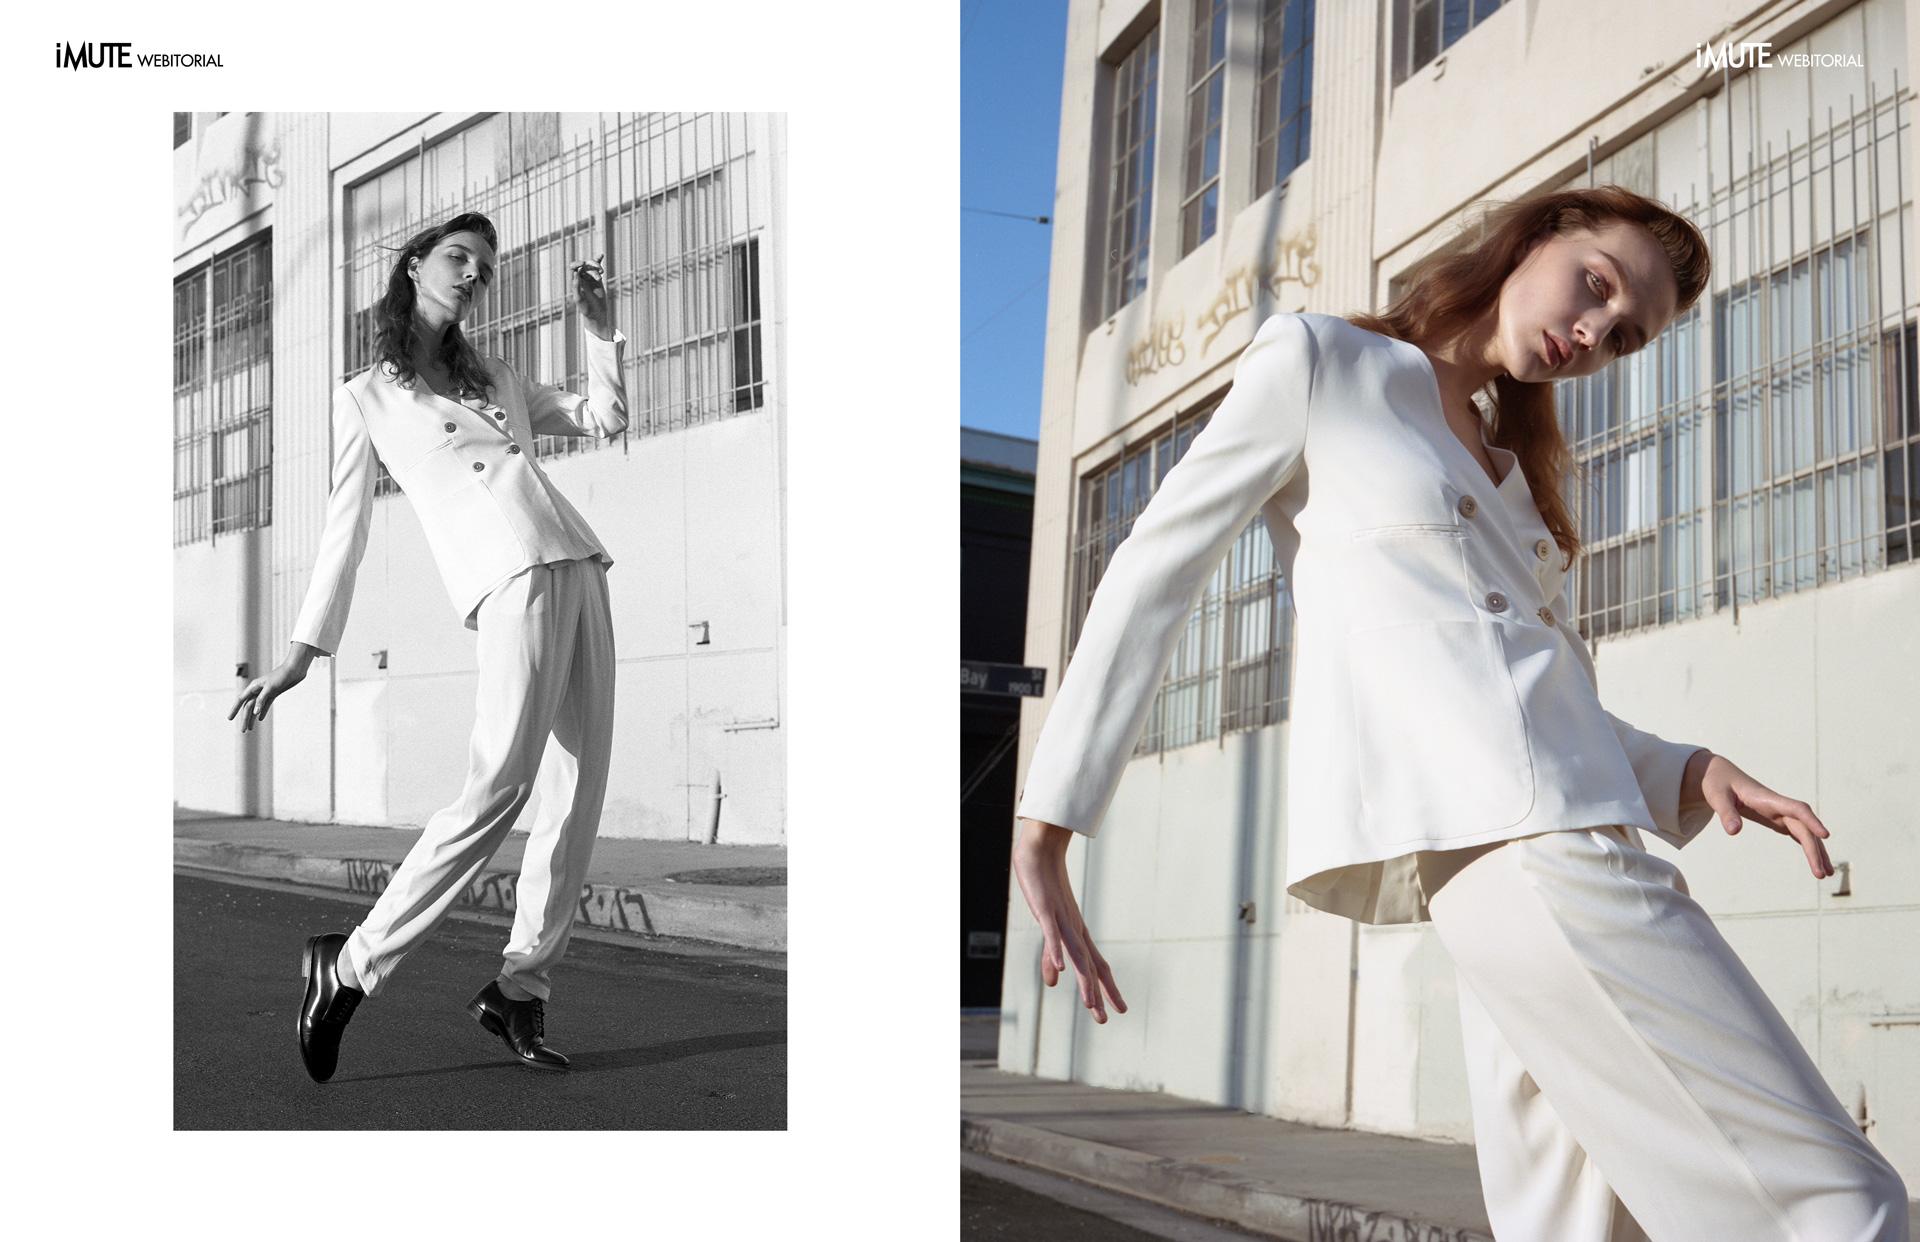 Anastasia webitorial for iMute Magazine Photographer|Dylan Kronen Model| Anastasia Muray @Photogenics Stylist|Caitlin Eucker @ WilhelminaArtists Make up| Megumi Asai Hair| Diane Dusting